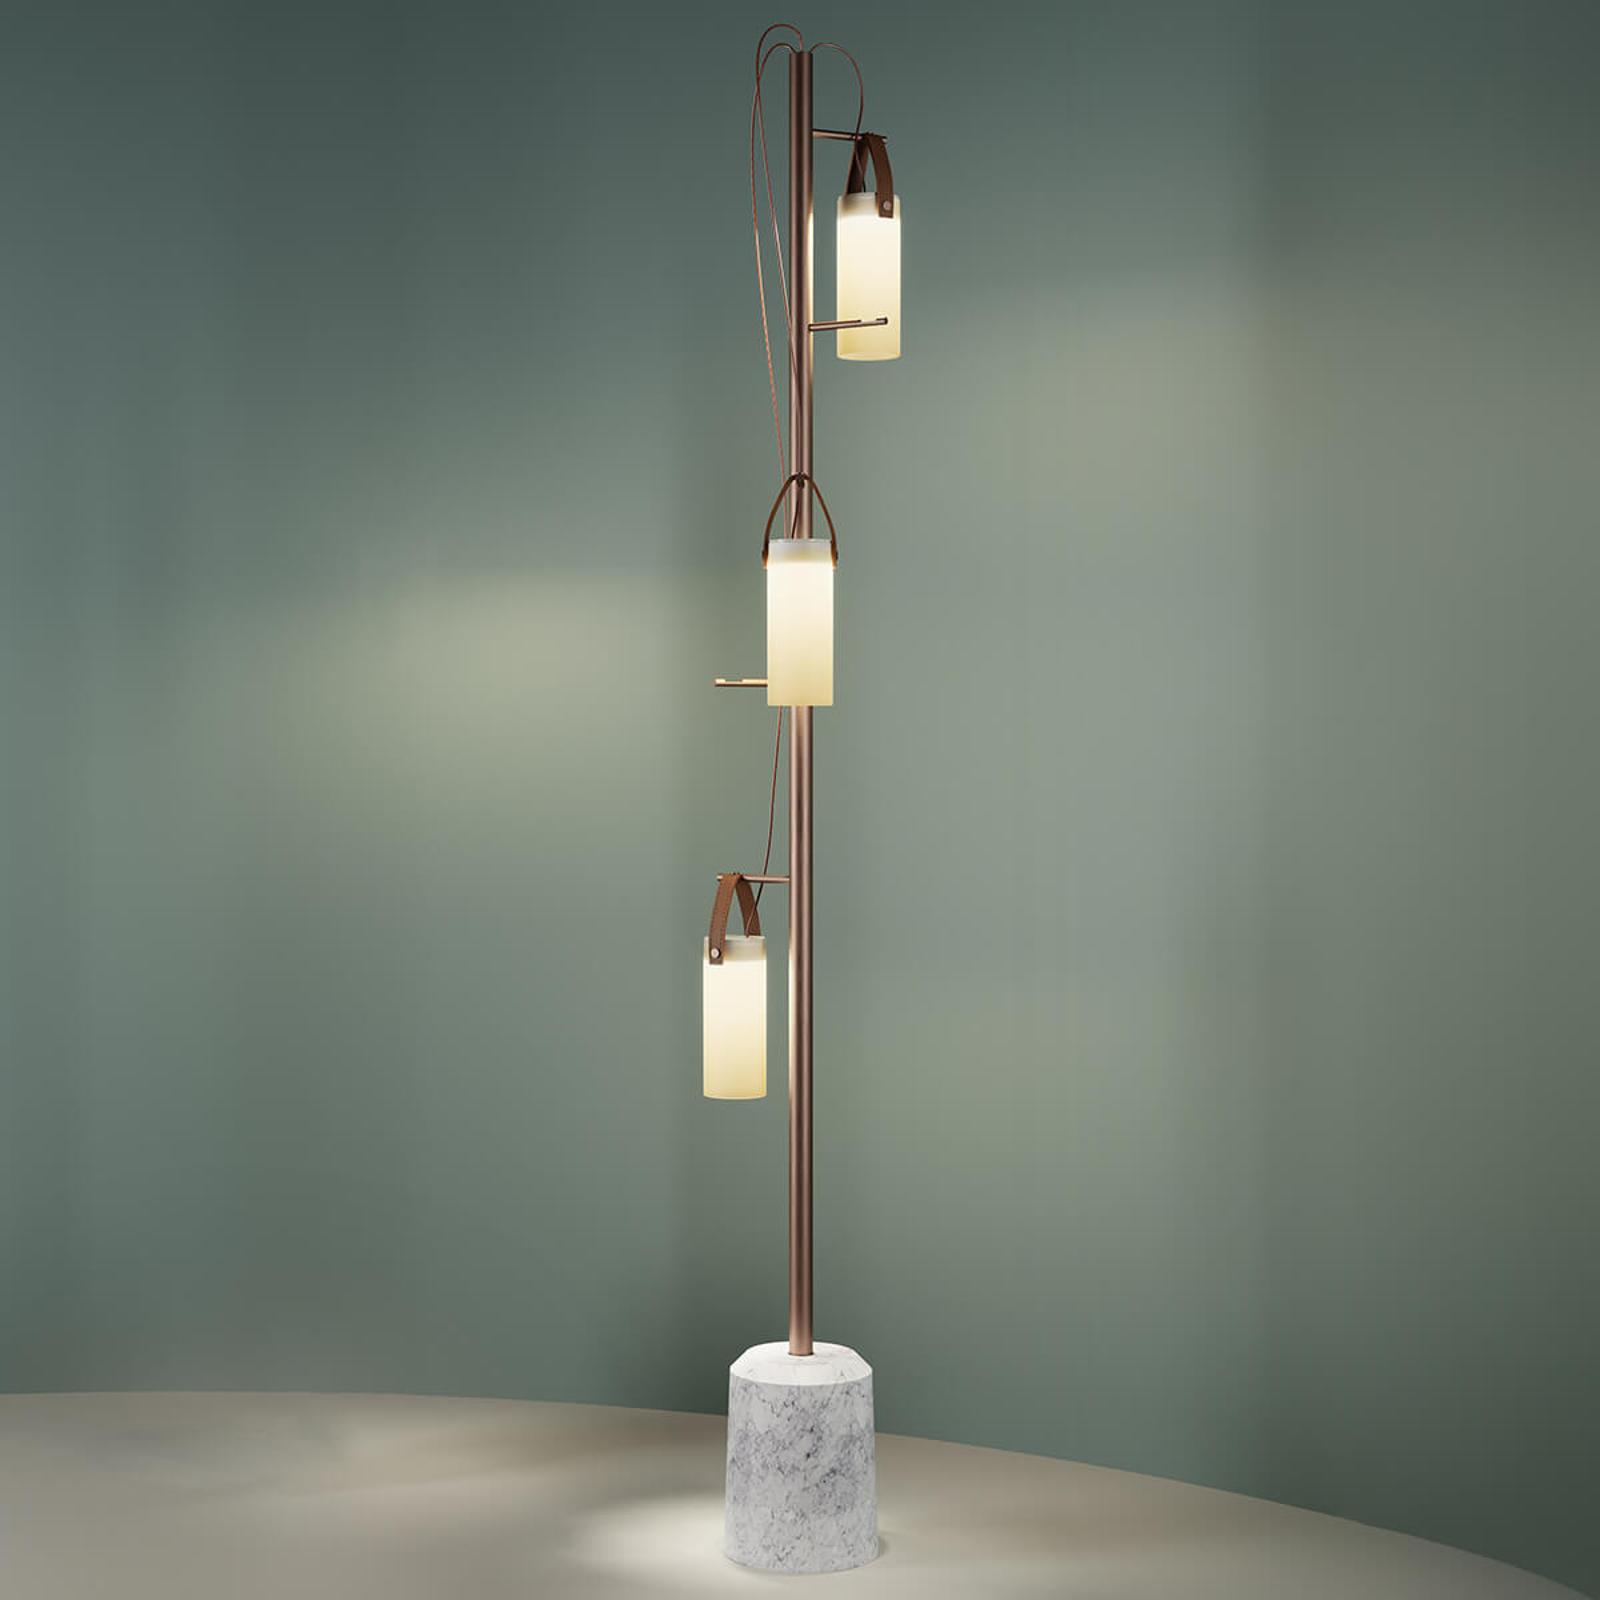 3-punktowa designerska lampa stojąca LED Galerie